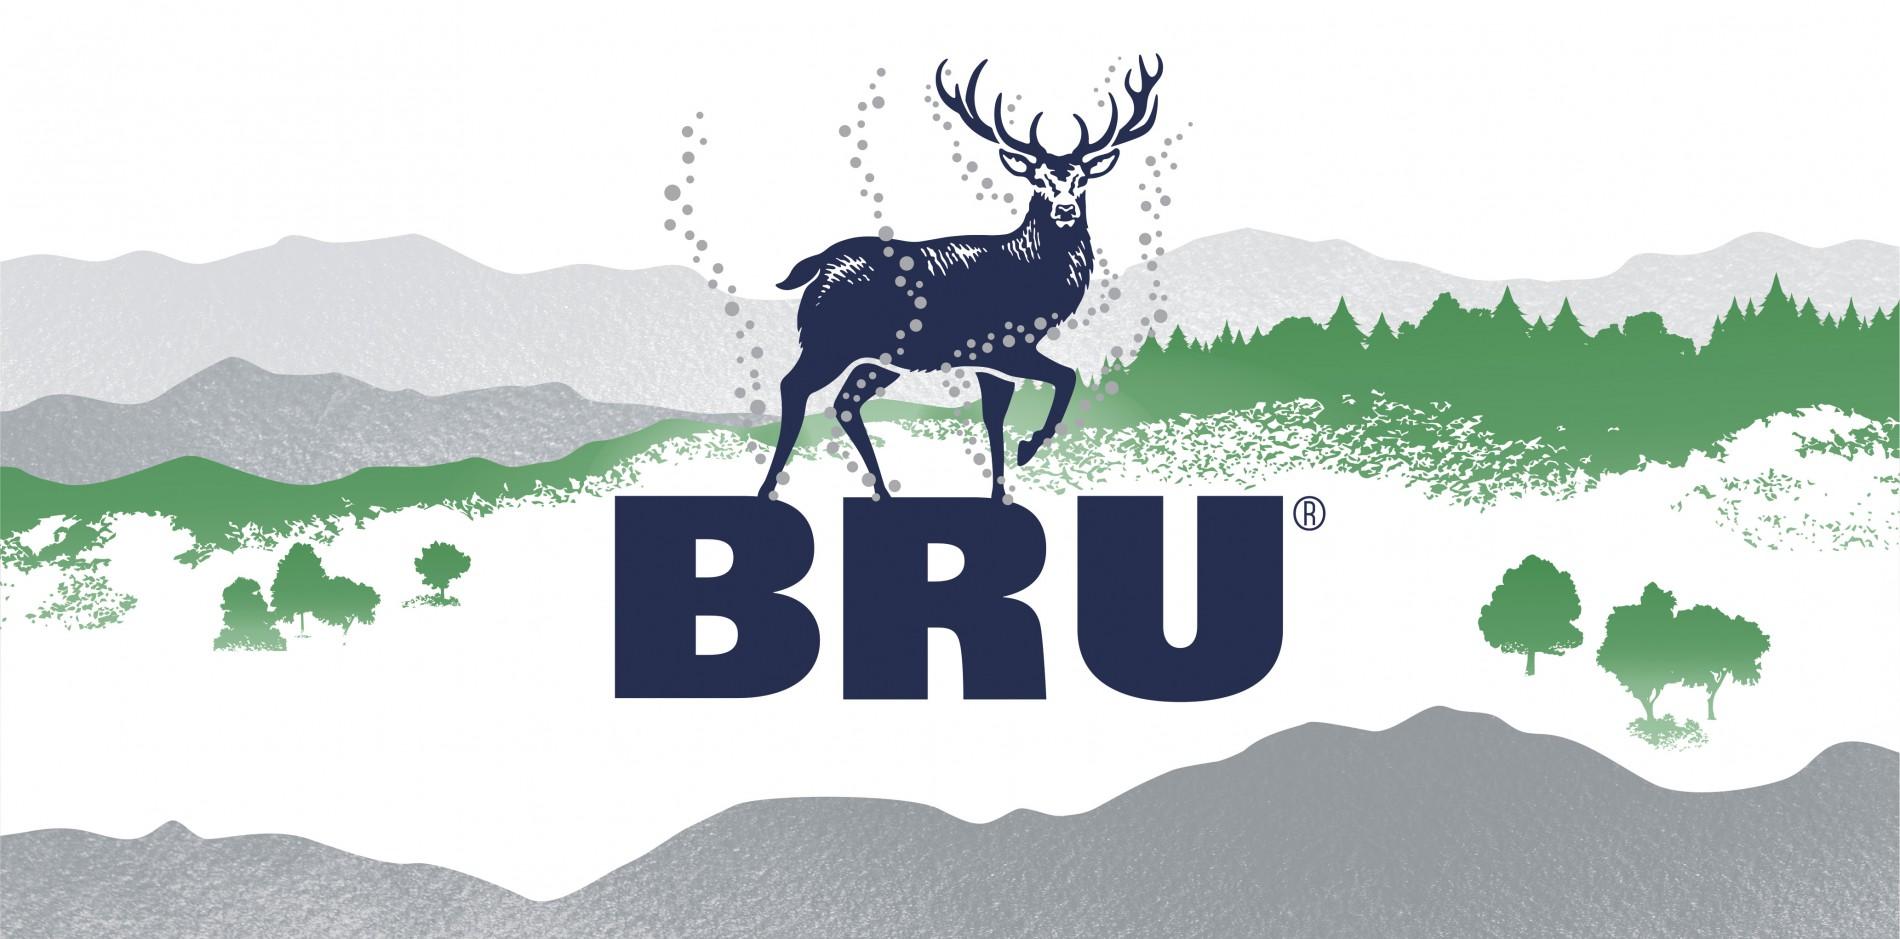 The reawakening of the Bru brand